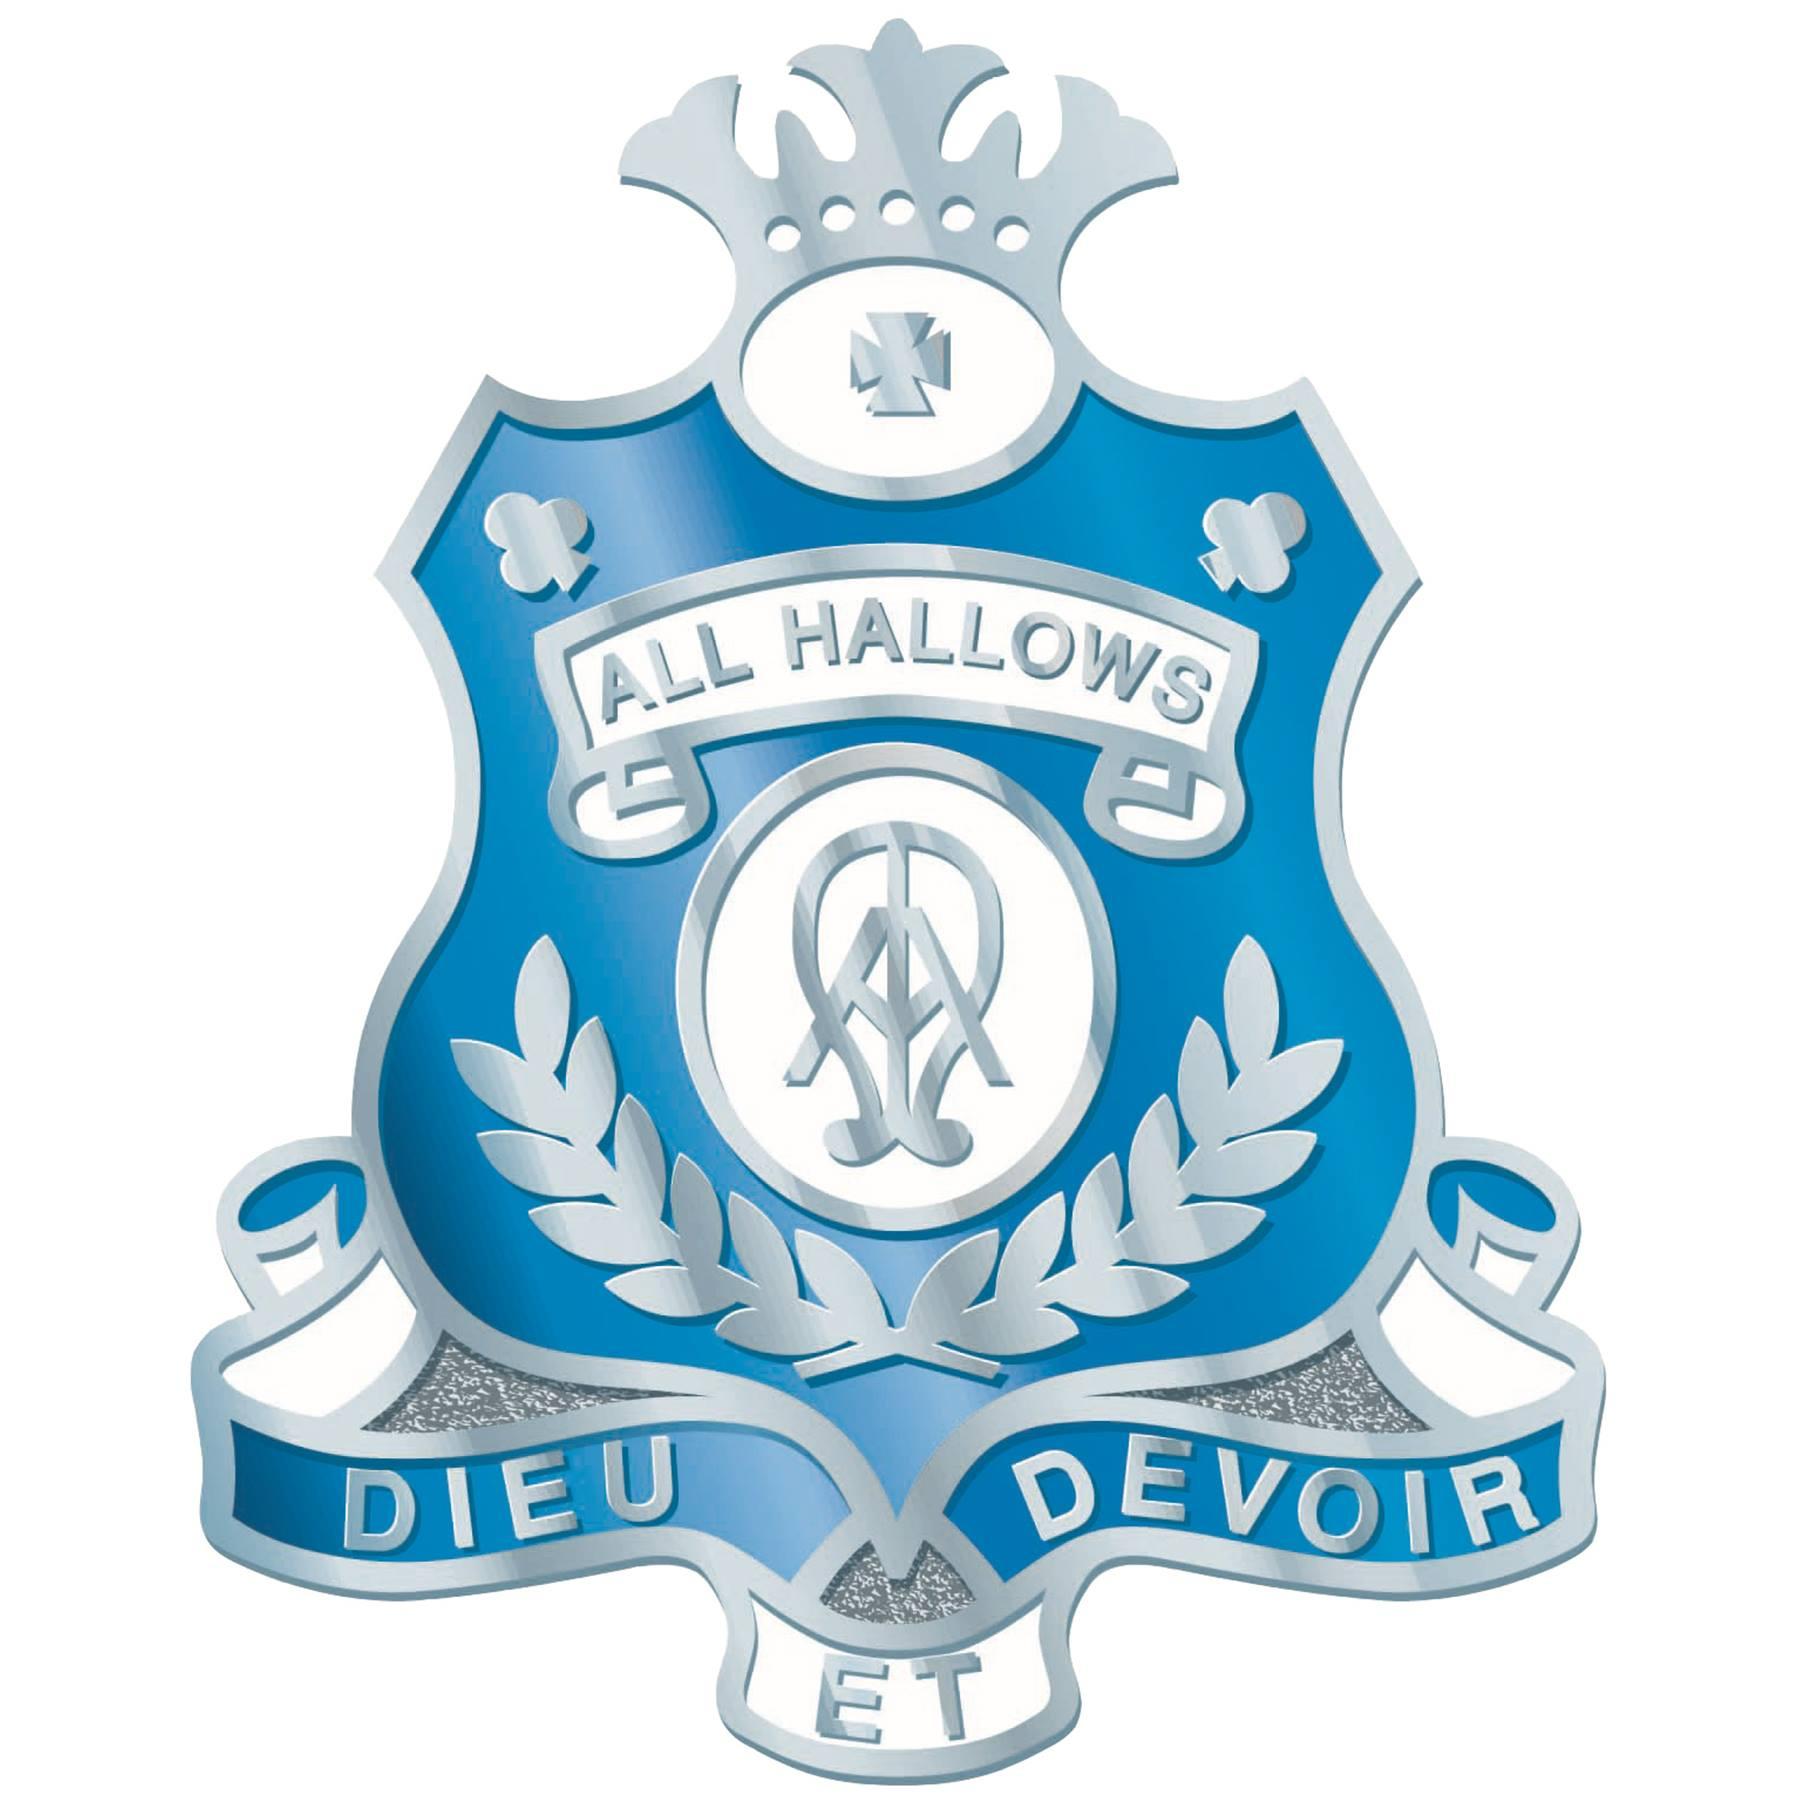 All Hallows School